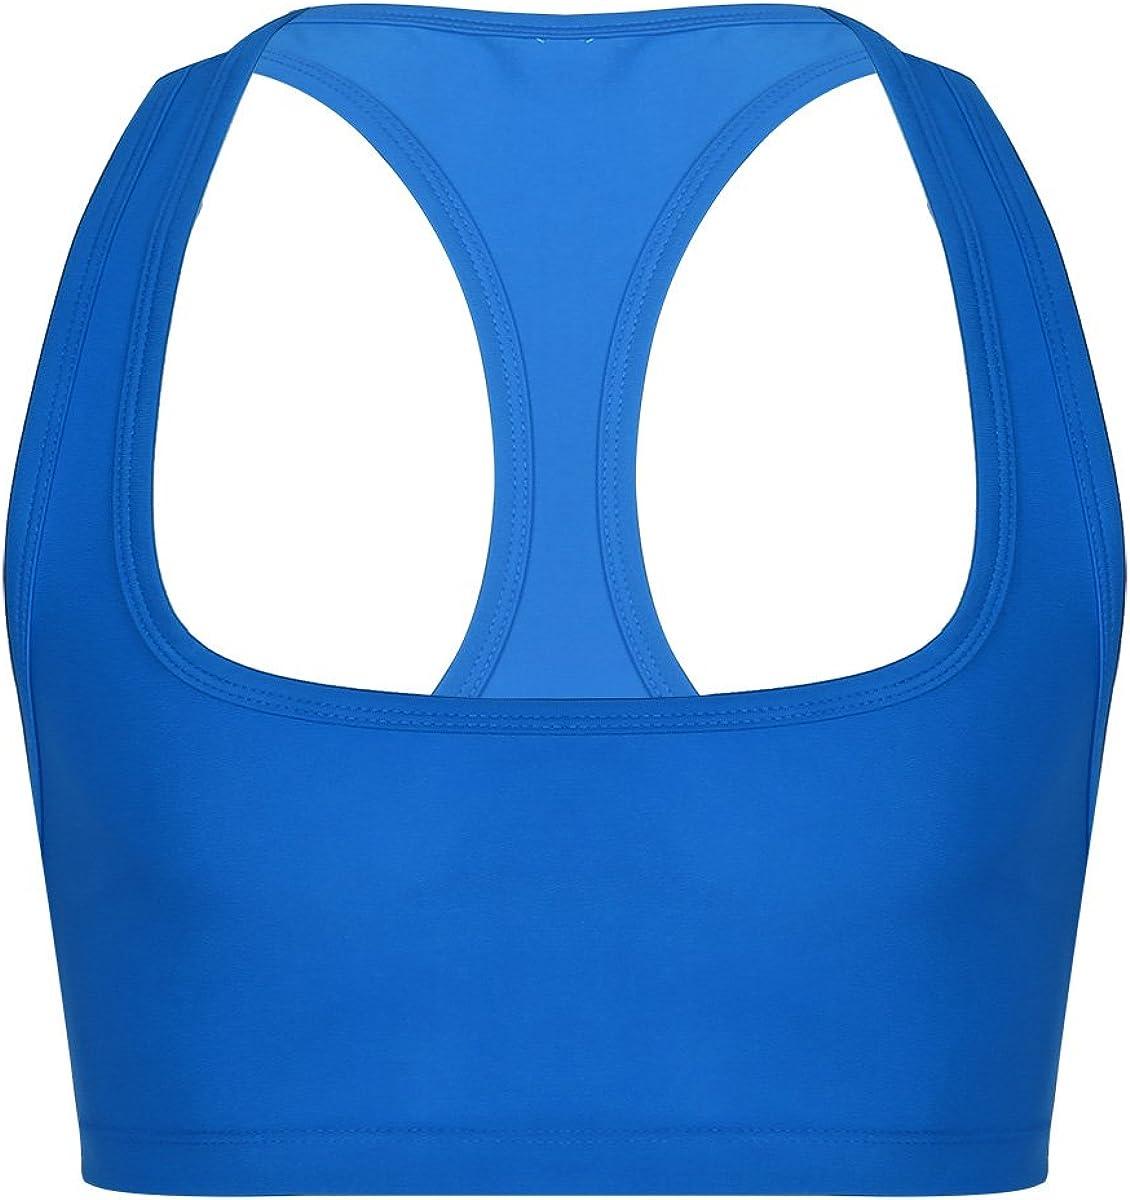 Freebily Mens Bodybuilding Workout Gym Muscle Half Tank Top Fitness Shirt Vest Crop Tops